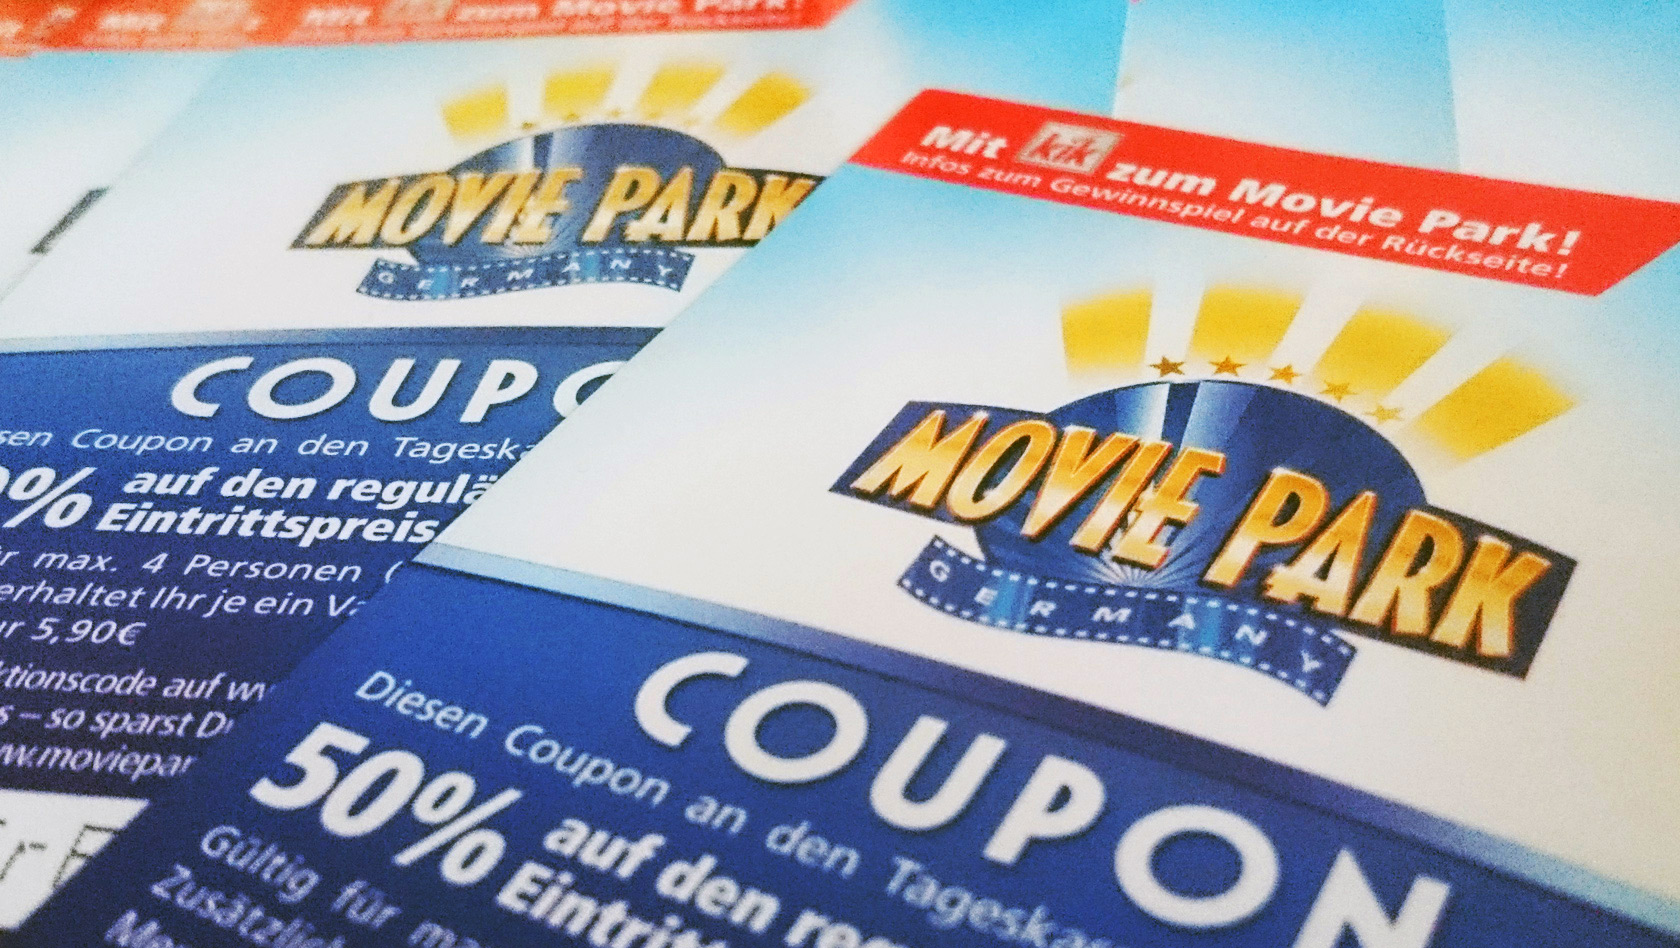 Movie park rabatt coupons 2019